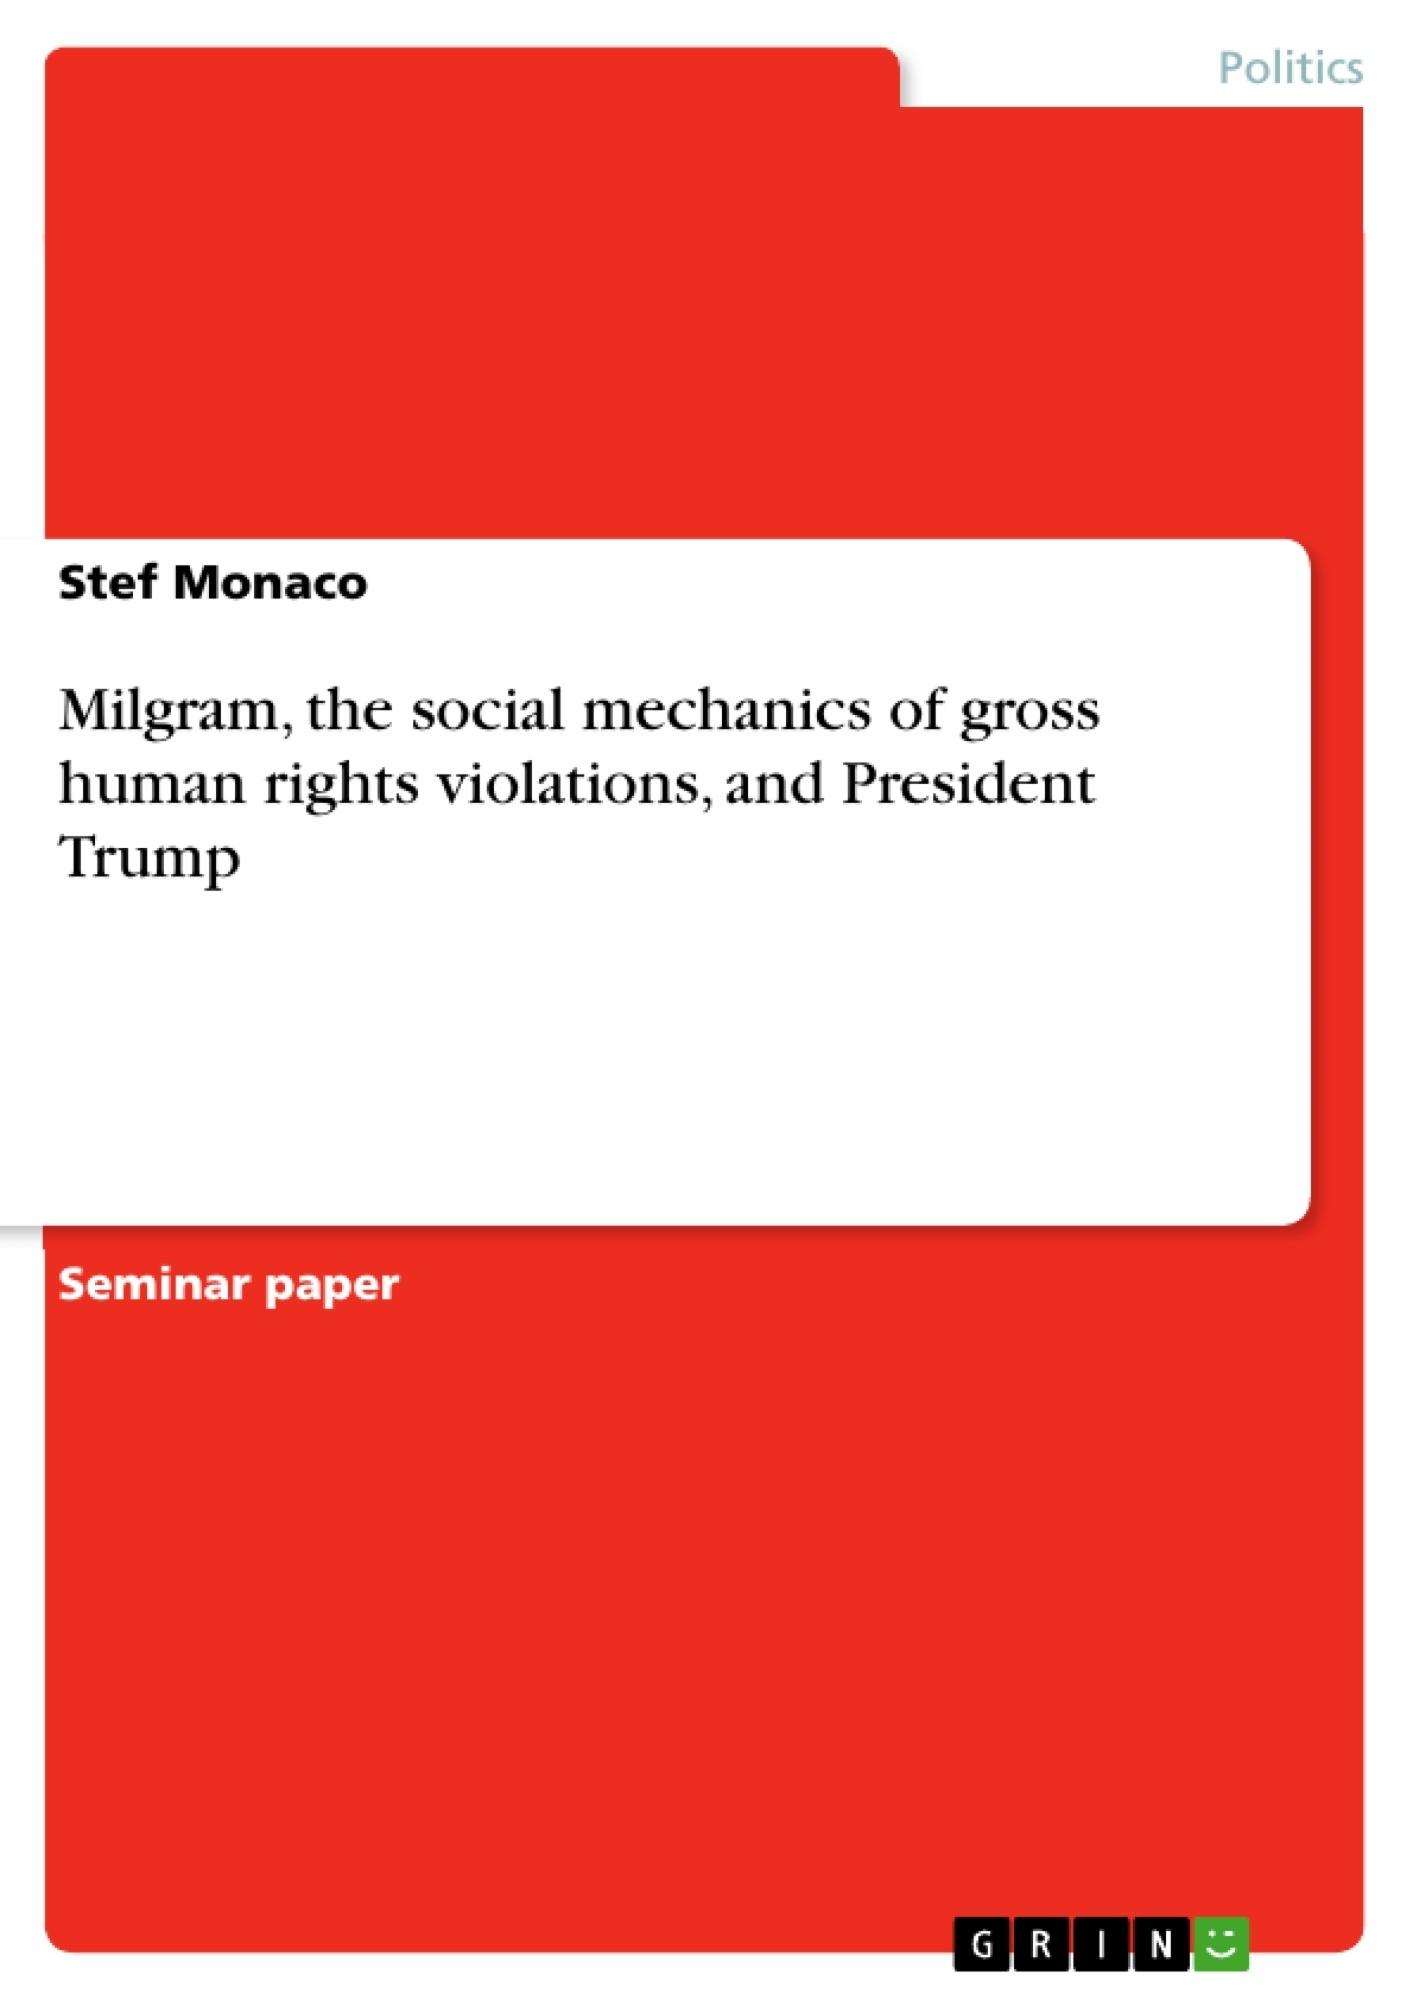 Title: Milgram, the social mechanics of gross human rights violations, and President Trump